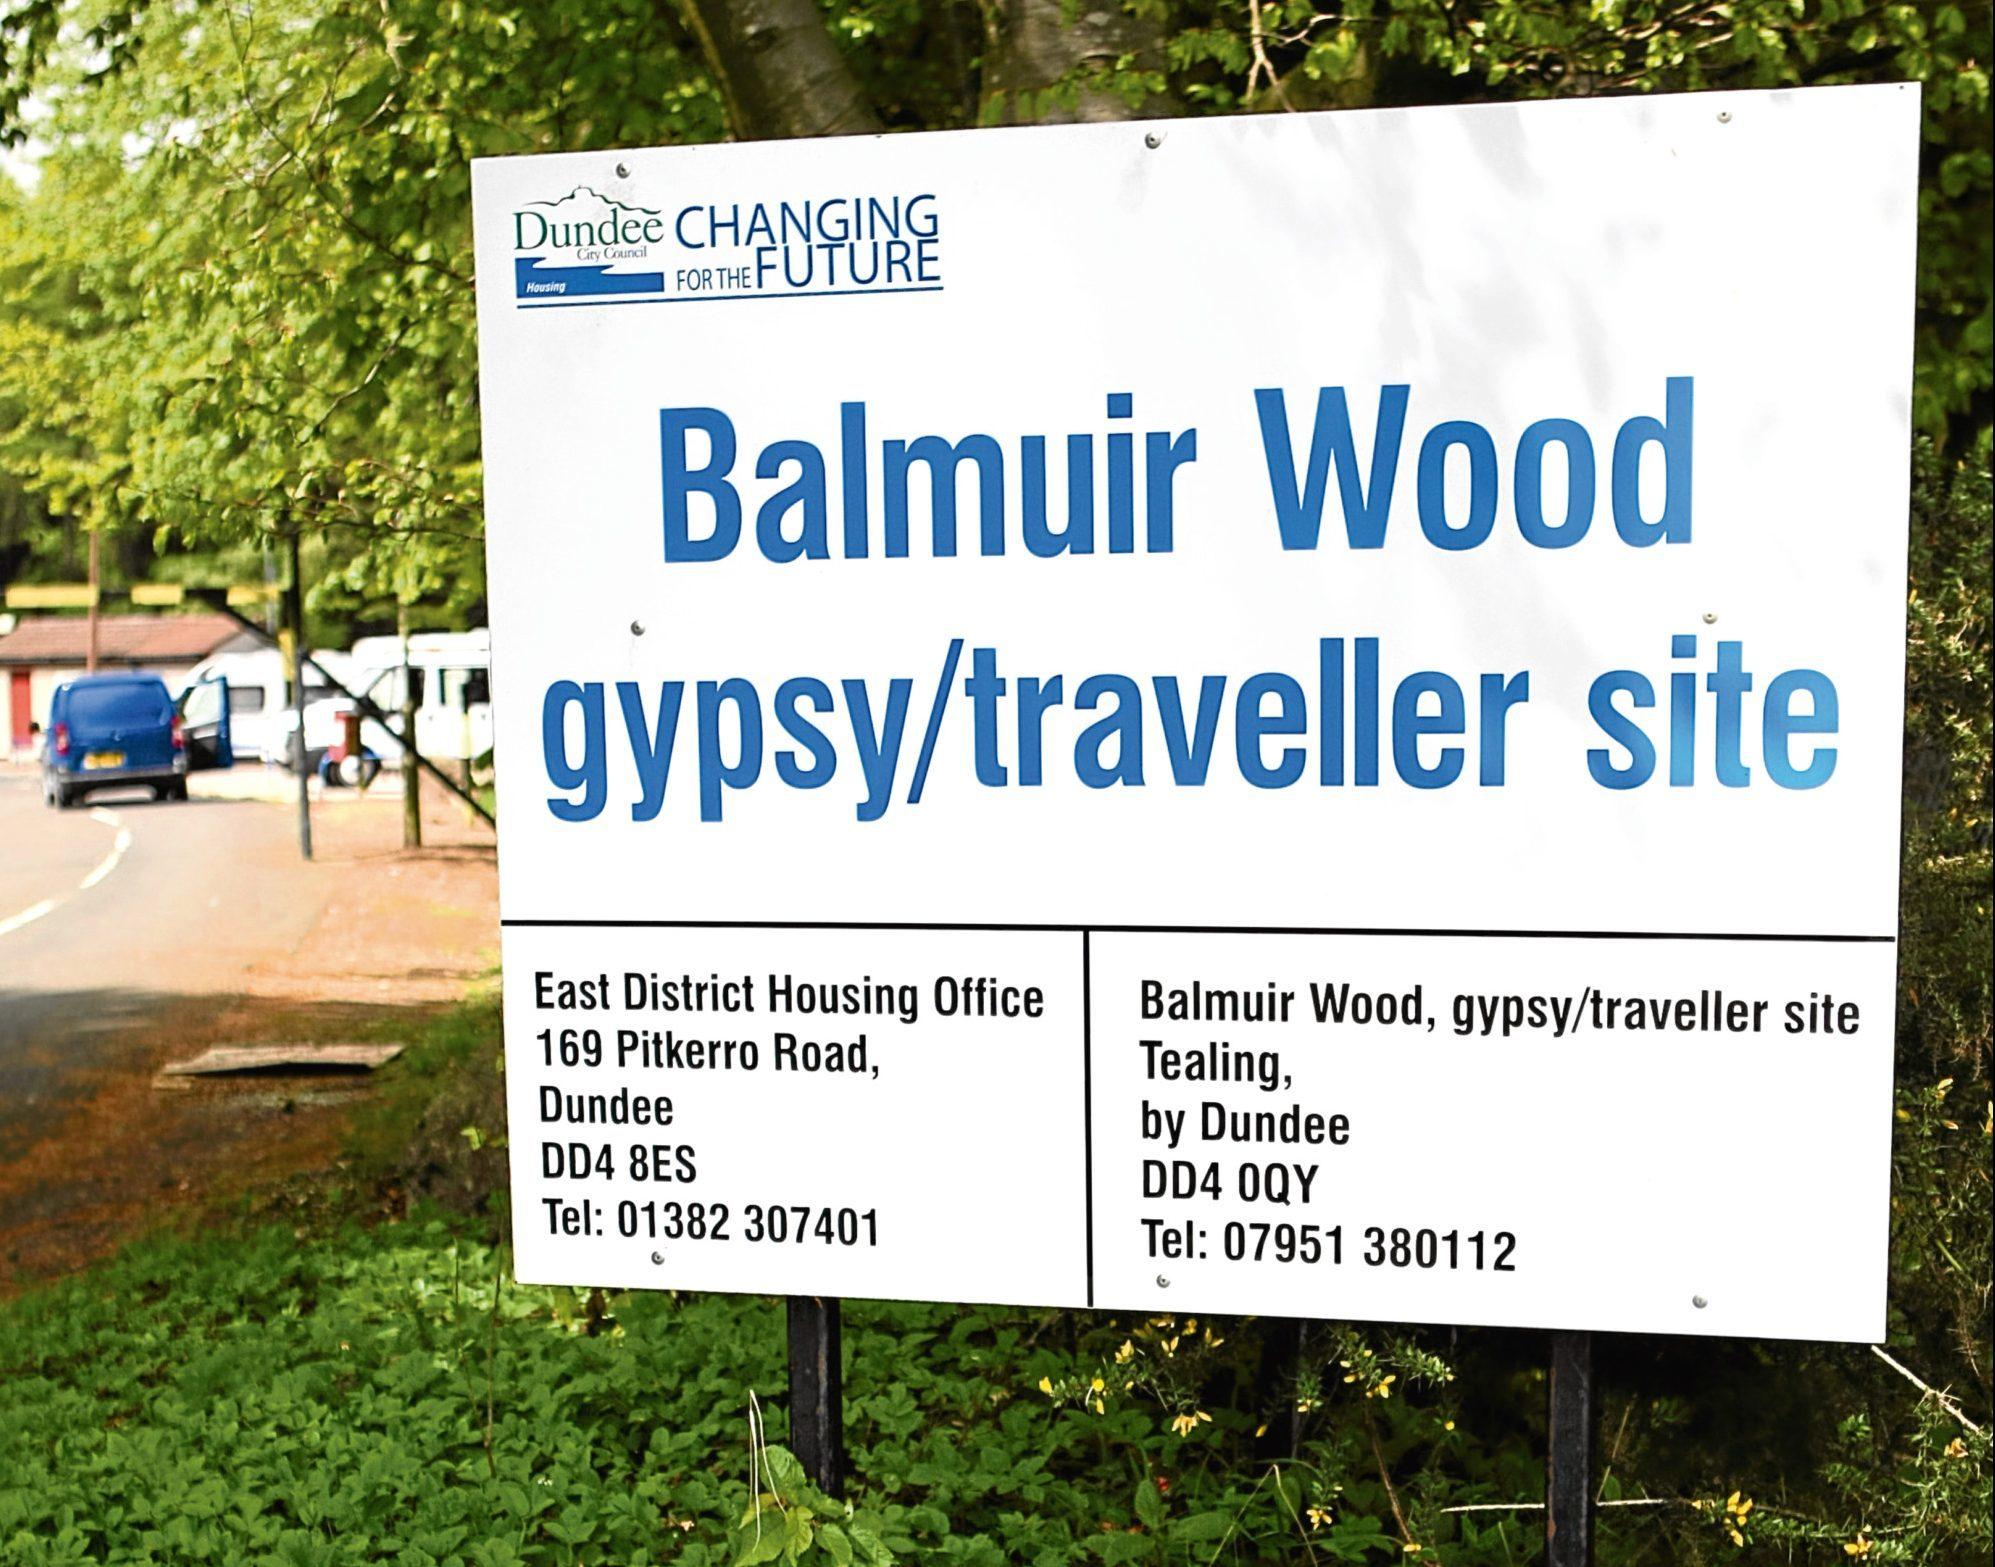 Balmuir Wood